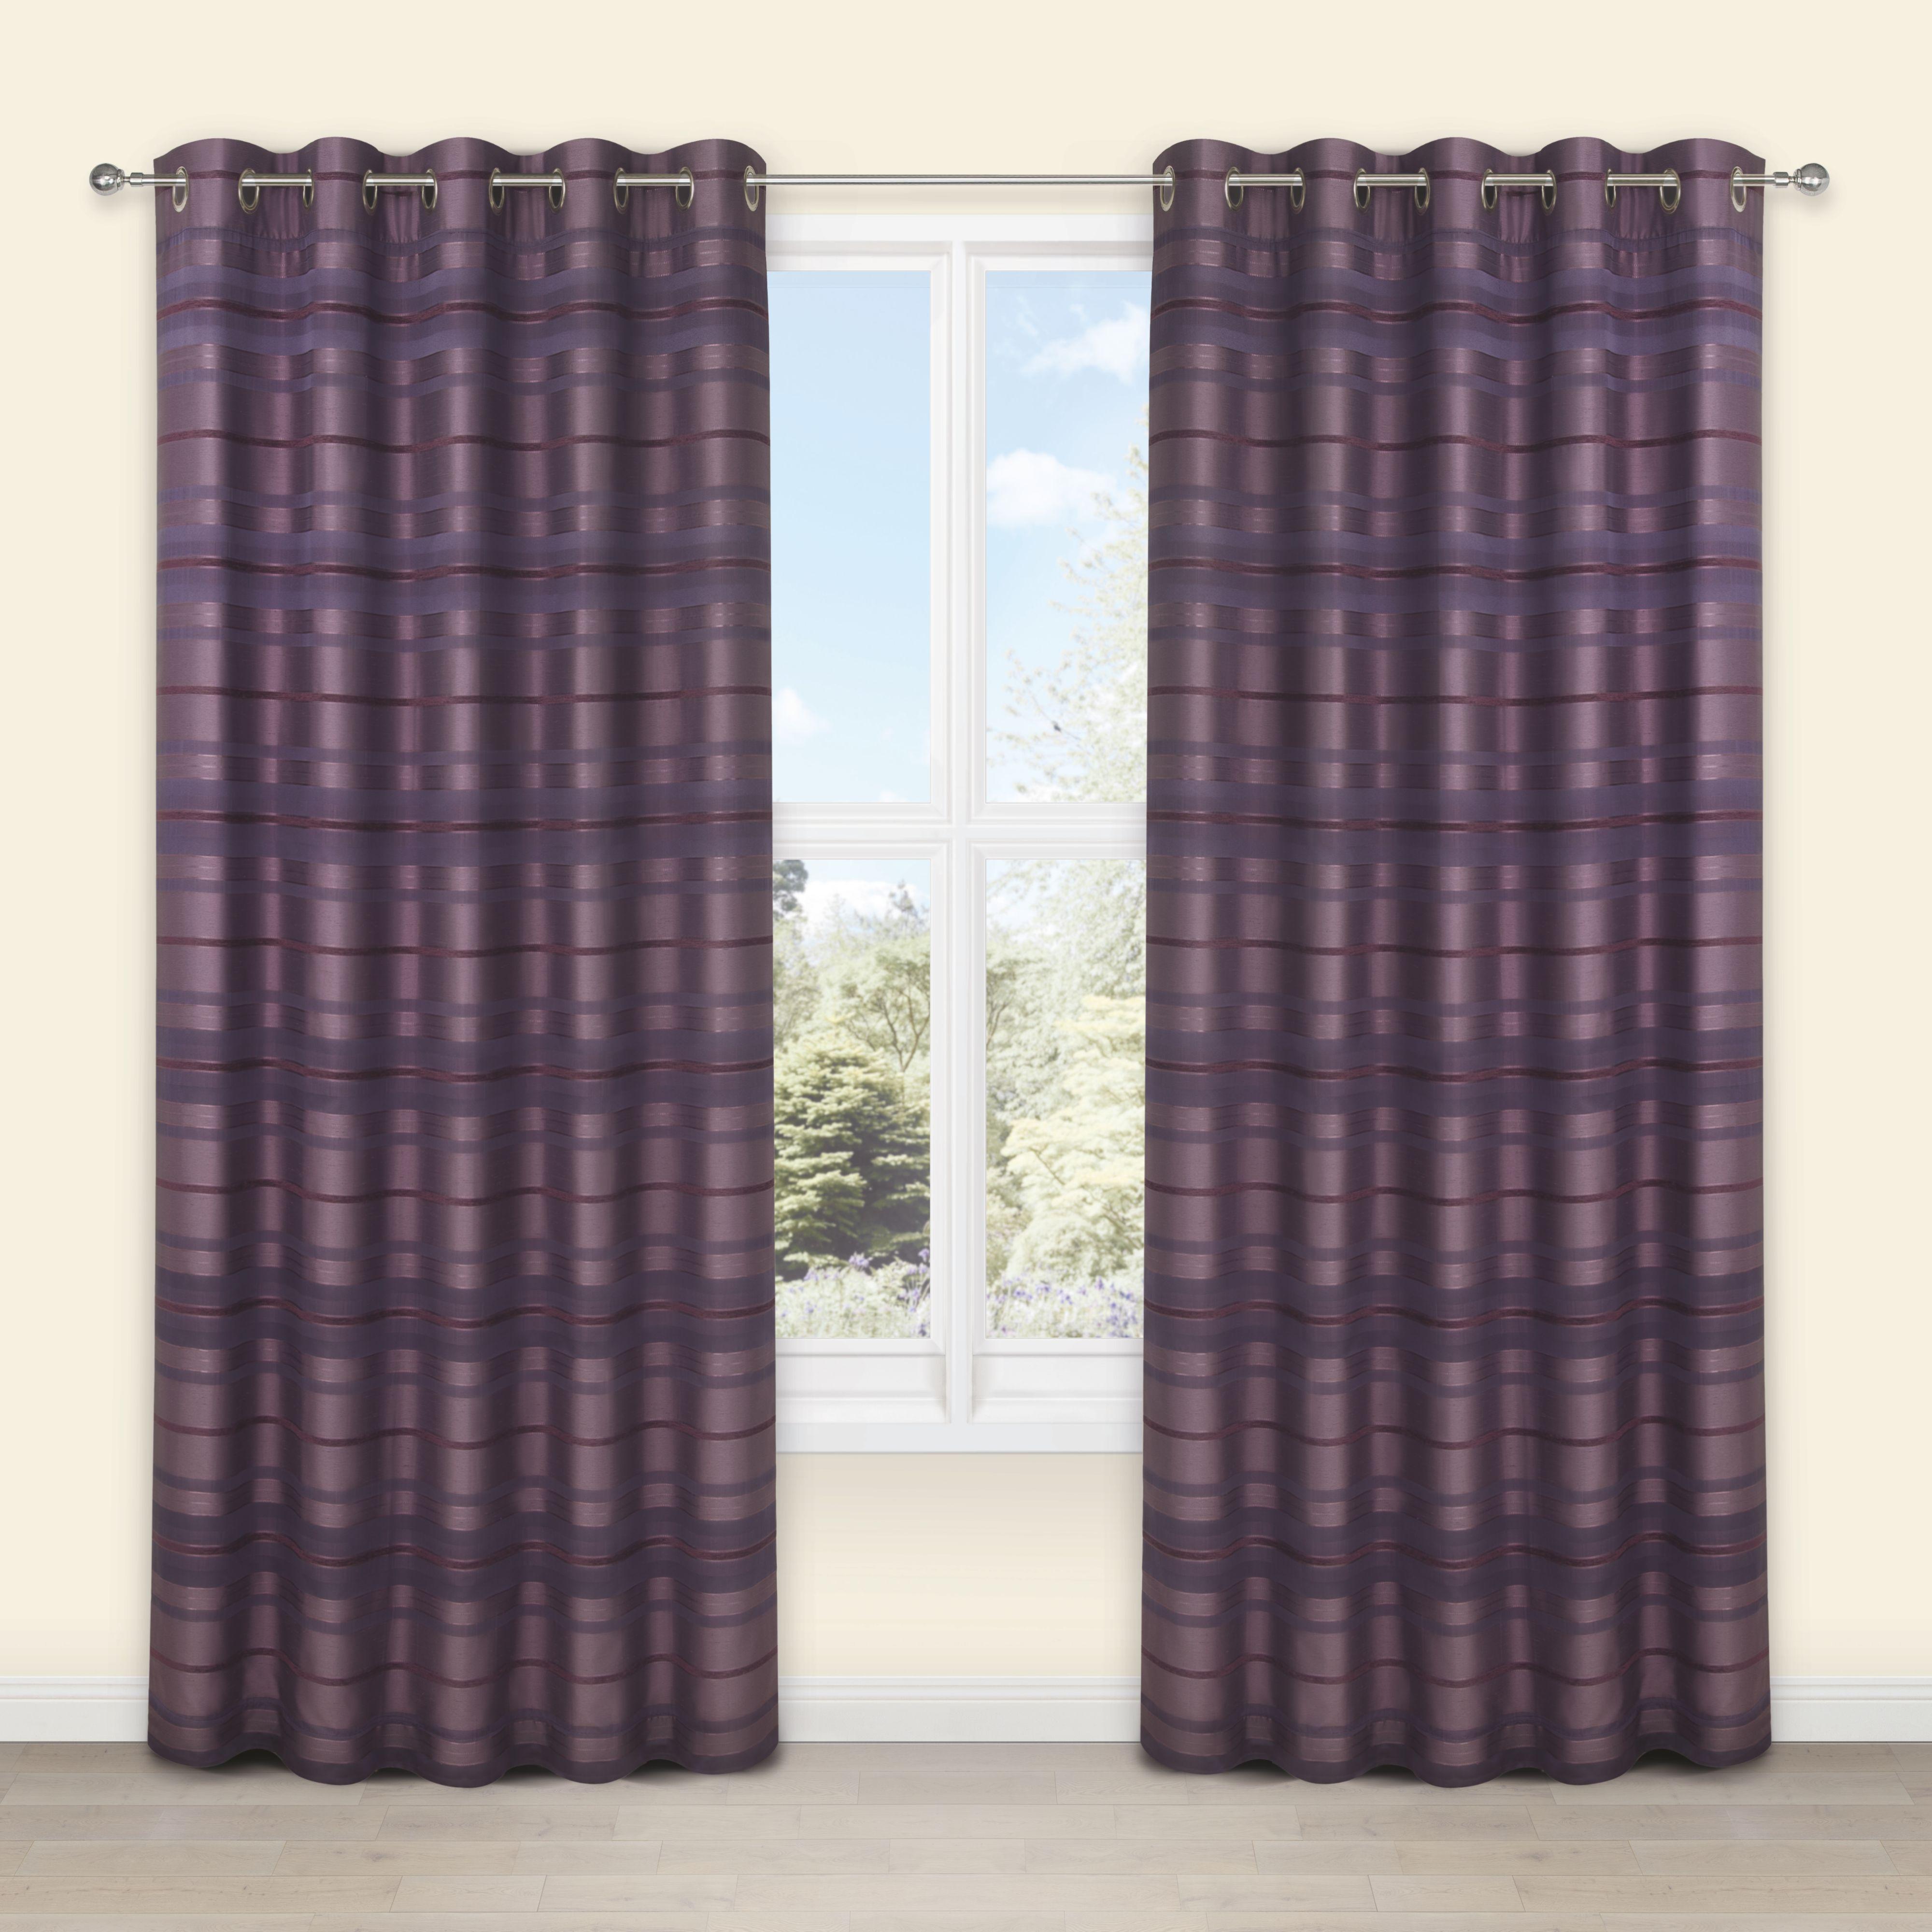 Plum curtains - Plum Bathroom Curtains Sarina Blueberry Plum Striped Woven Eyelet Lined Curtains W 167cm L 183cm